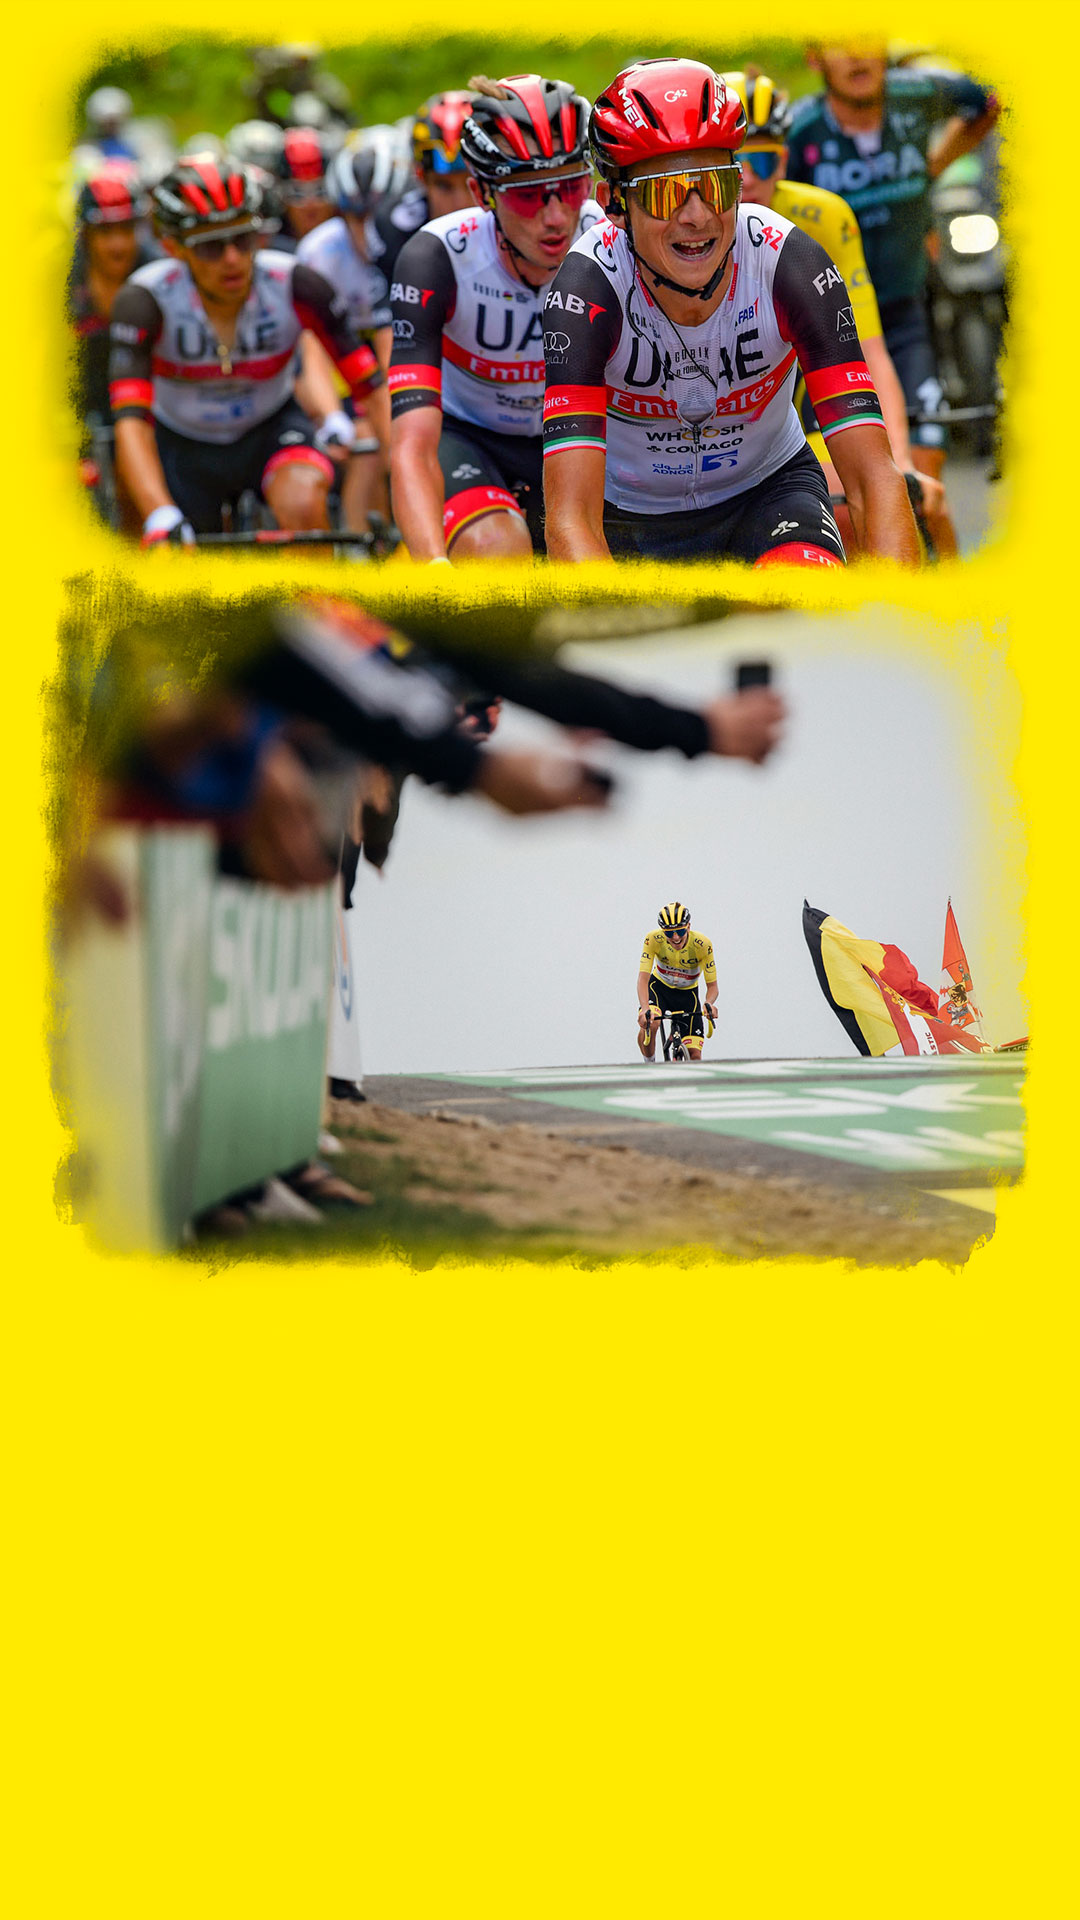 MET Helmets and Tadej Pogačar winner of the 2021 Tour de France